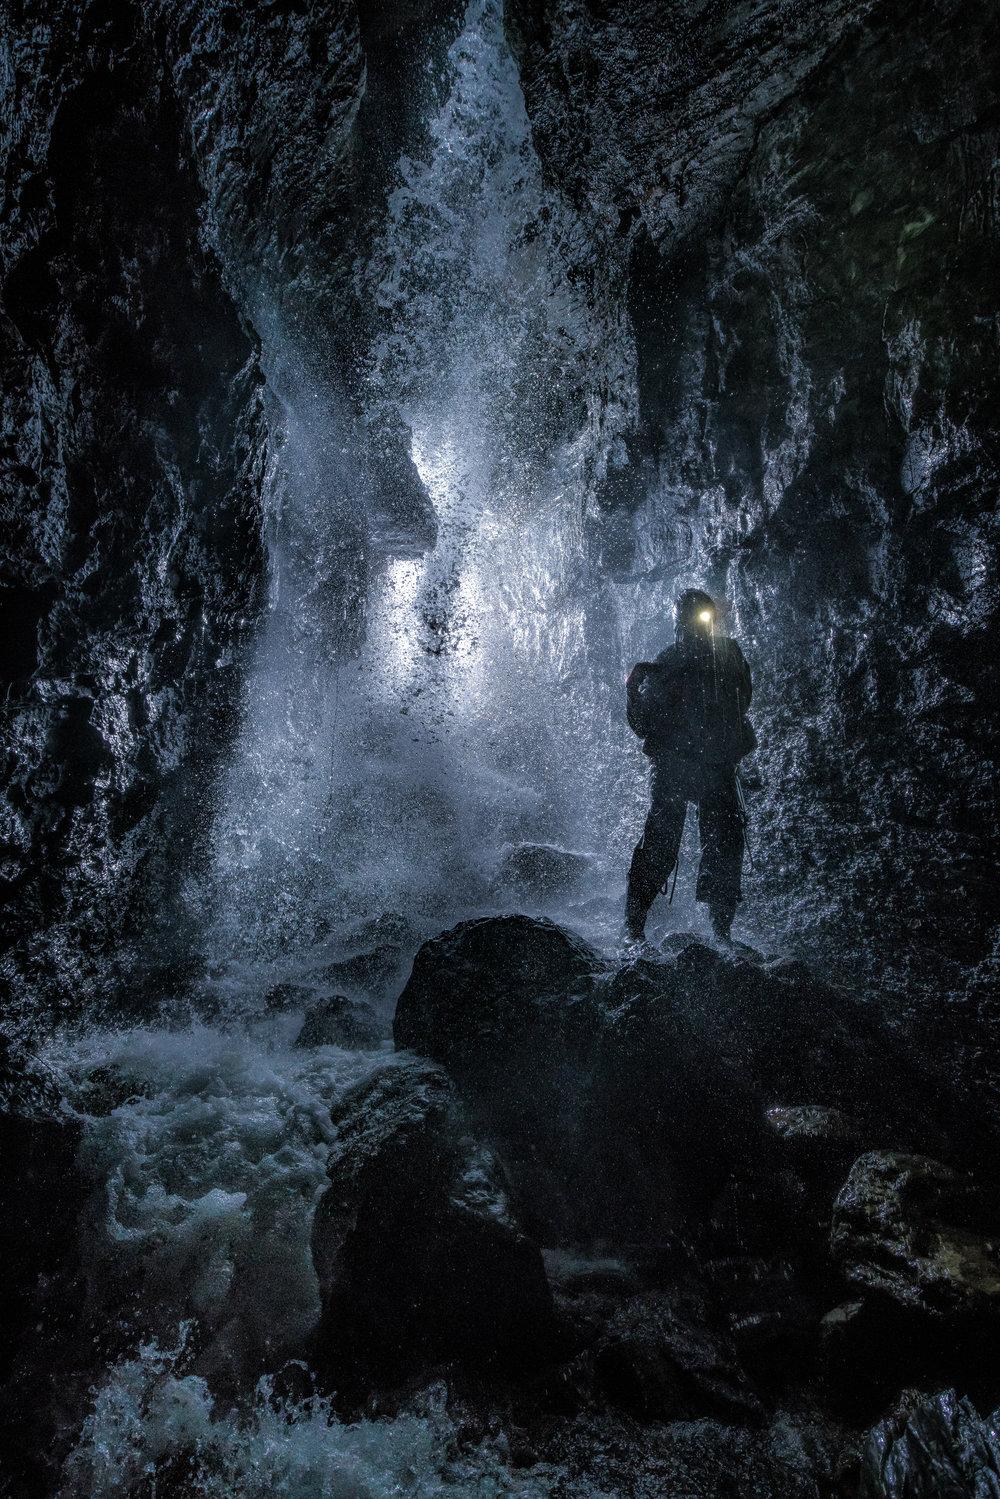 8_Hydeman_cave_explosive water_Papoose1-1.jpg